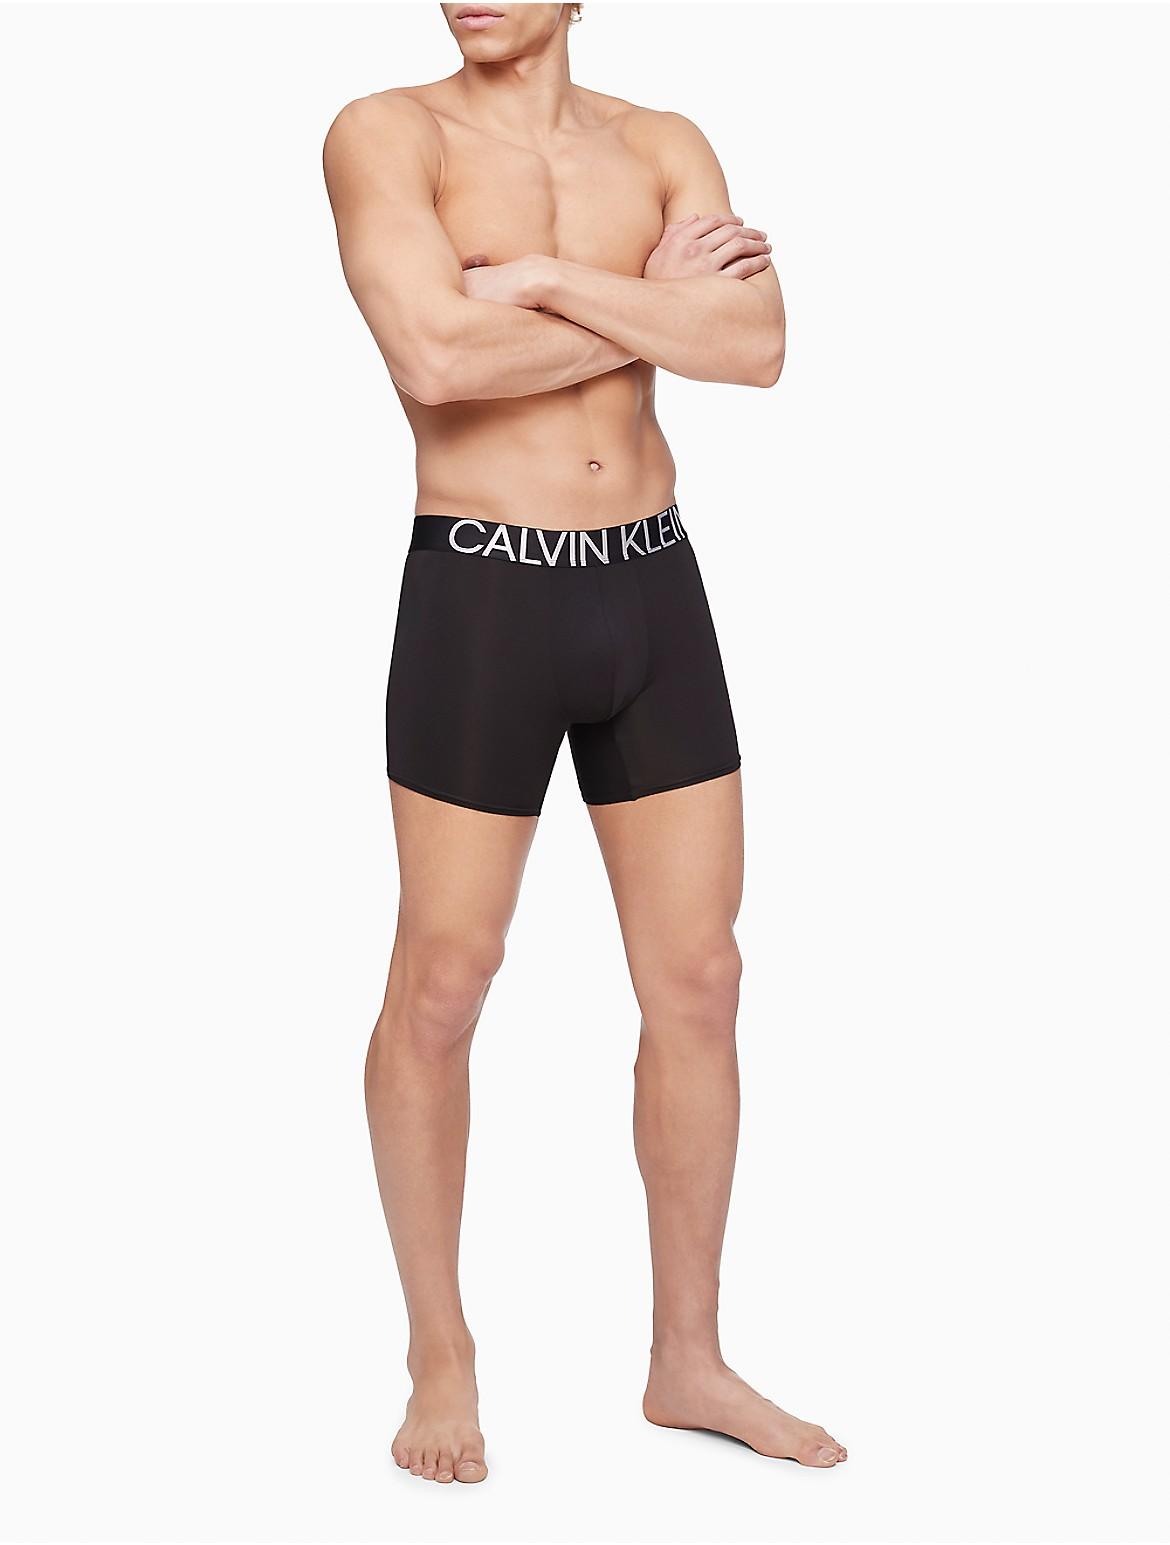 c1a0222b7b Men s Underwear   Women s Intimates